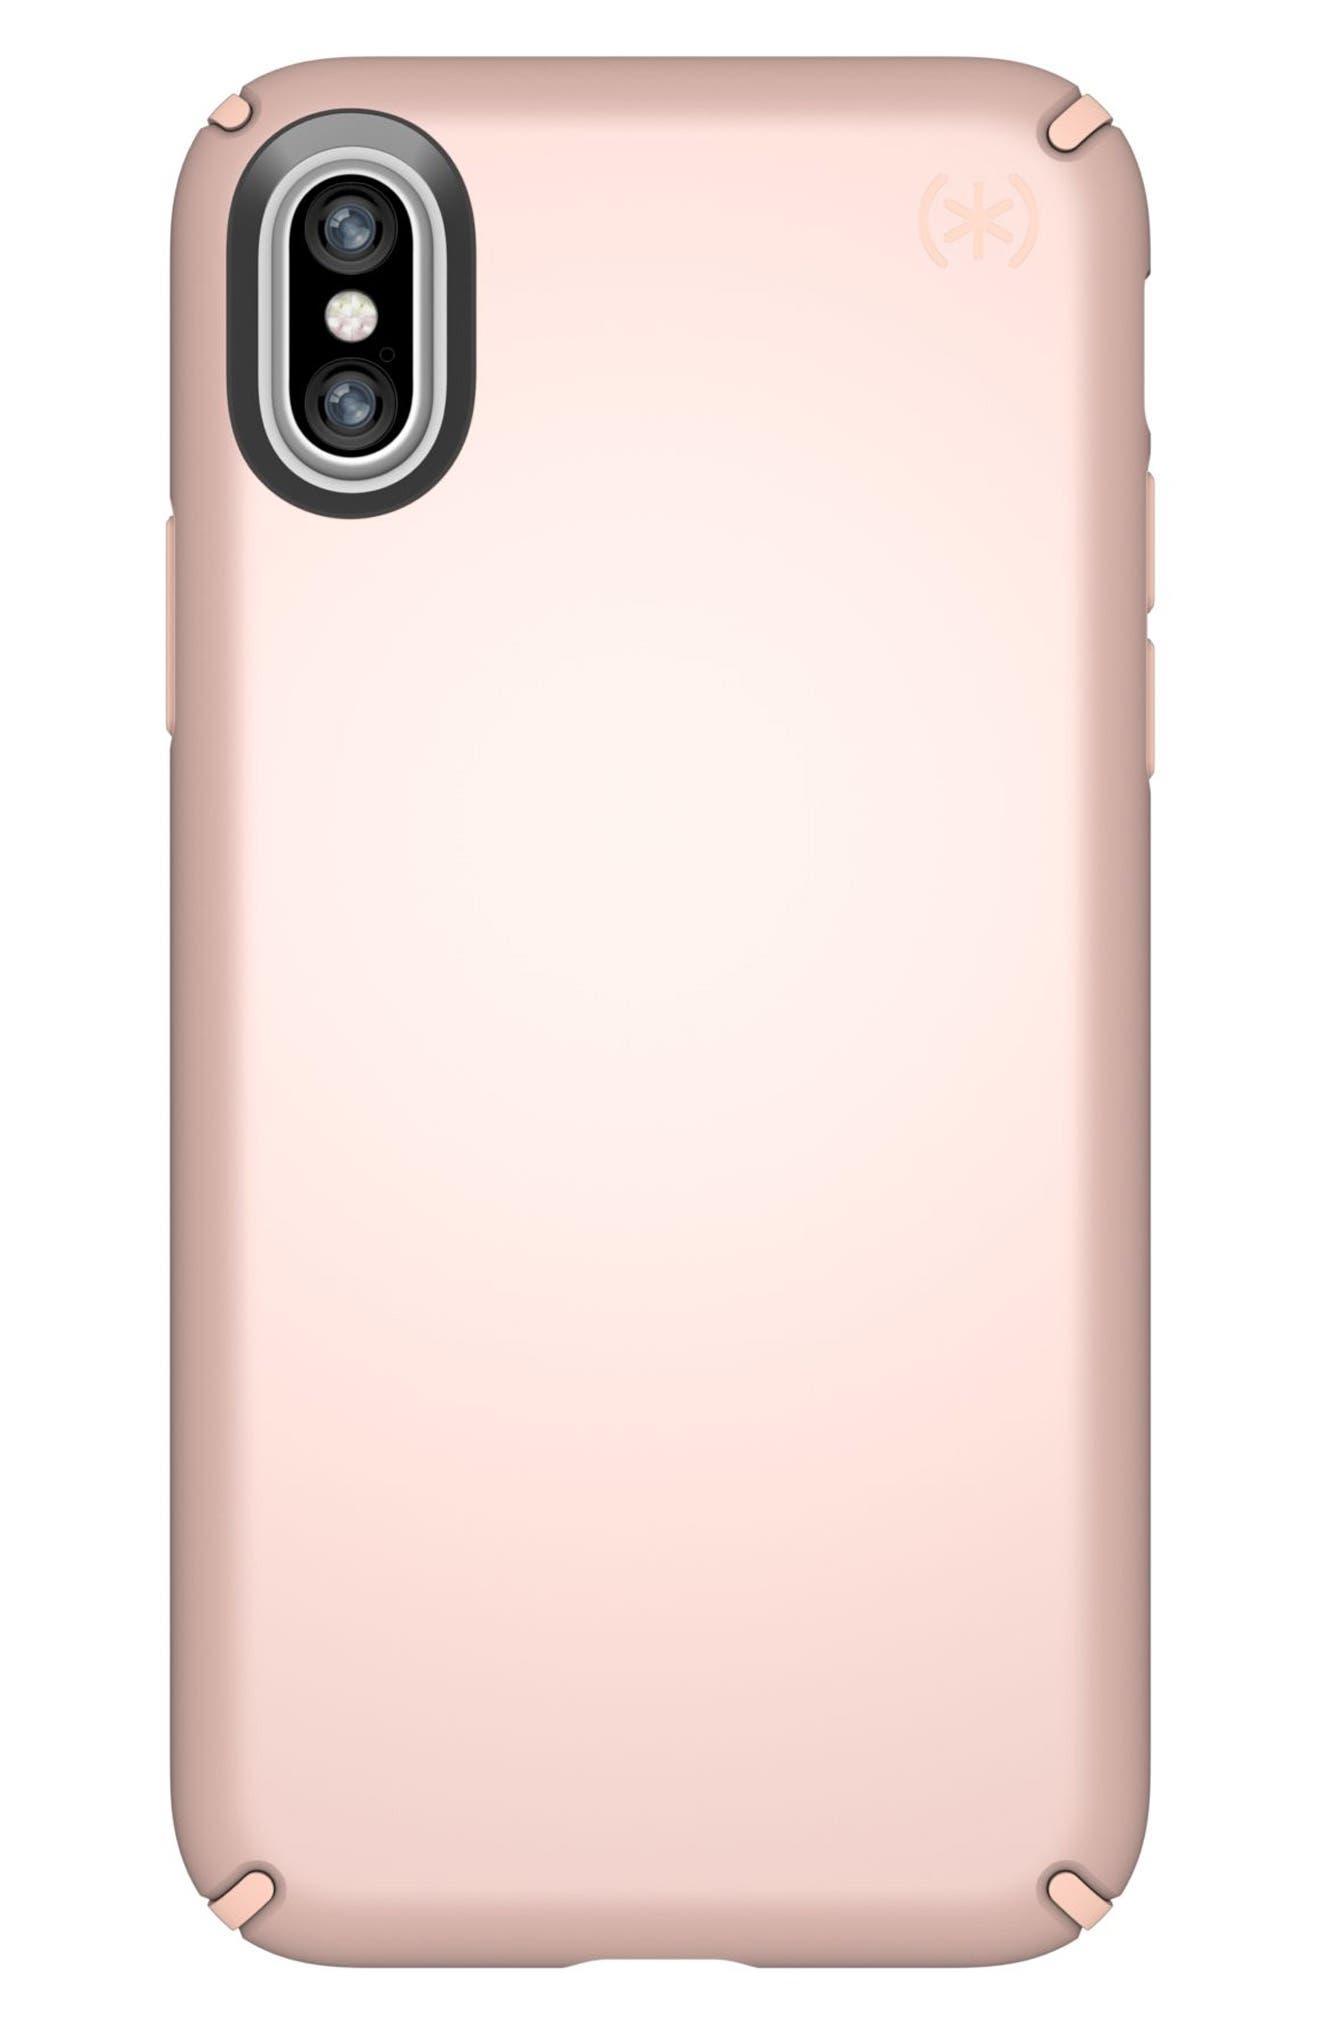 iPhone X Case,                         Main,                         color, Rose Gold Metallic/ Peach